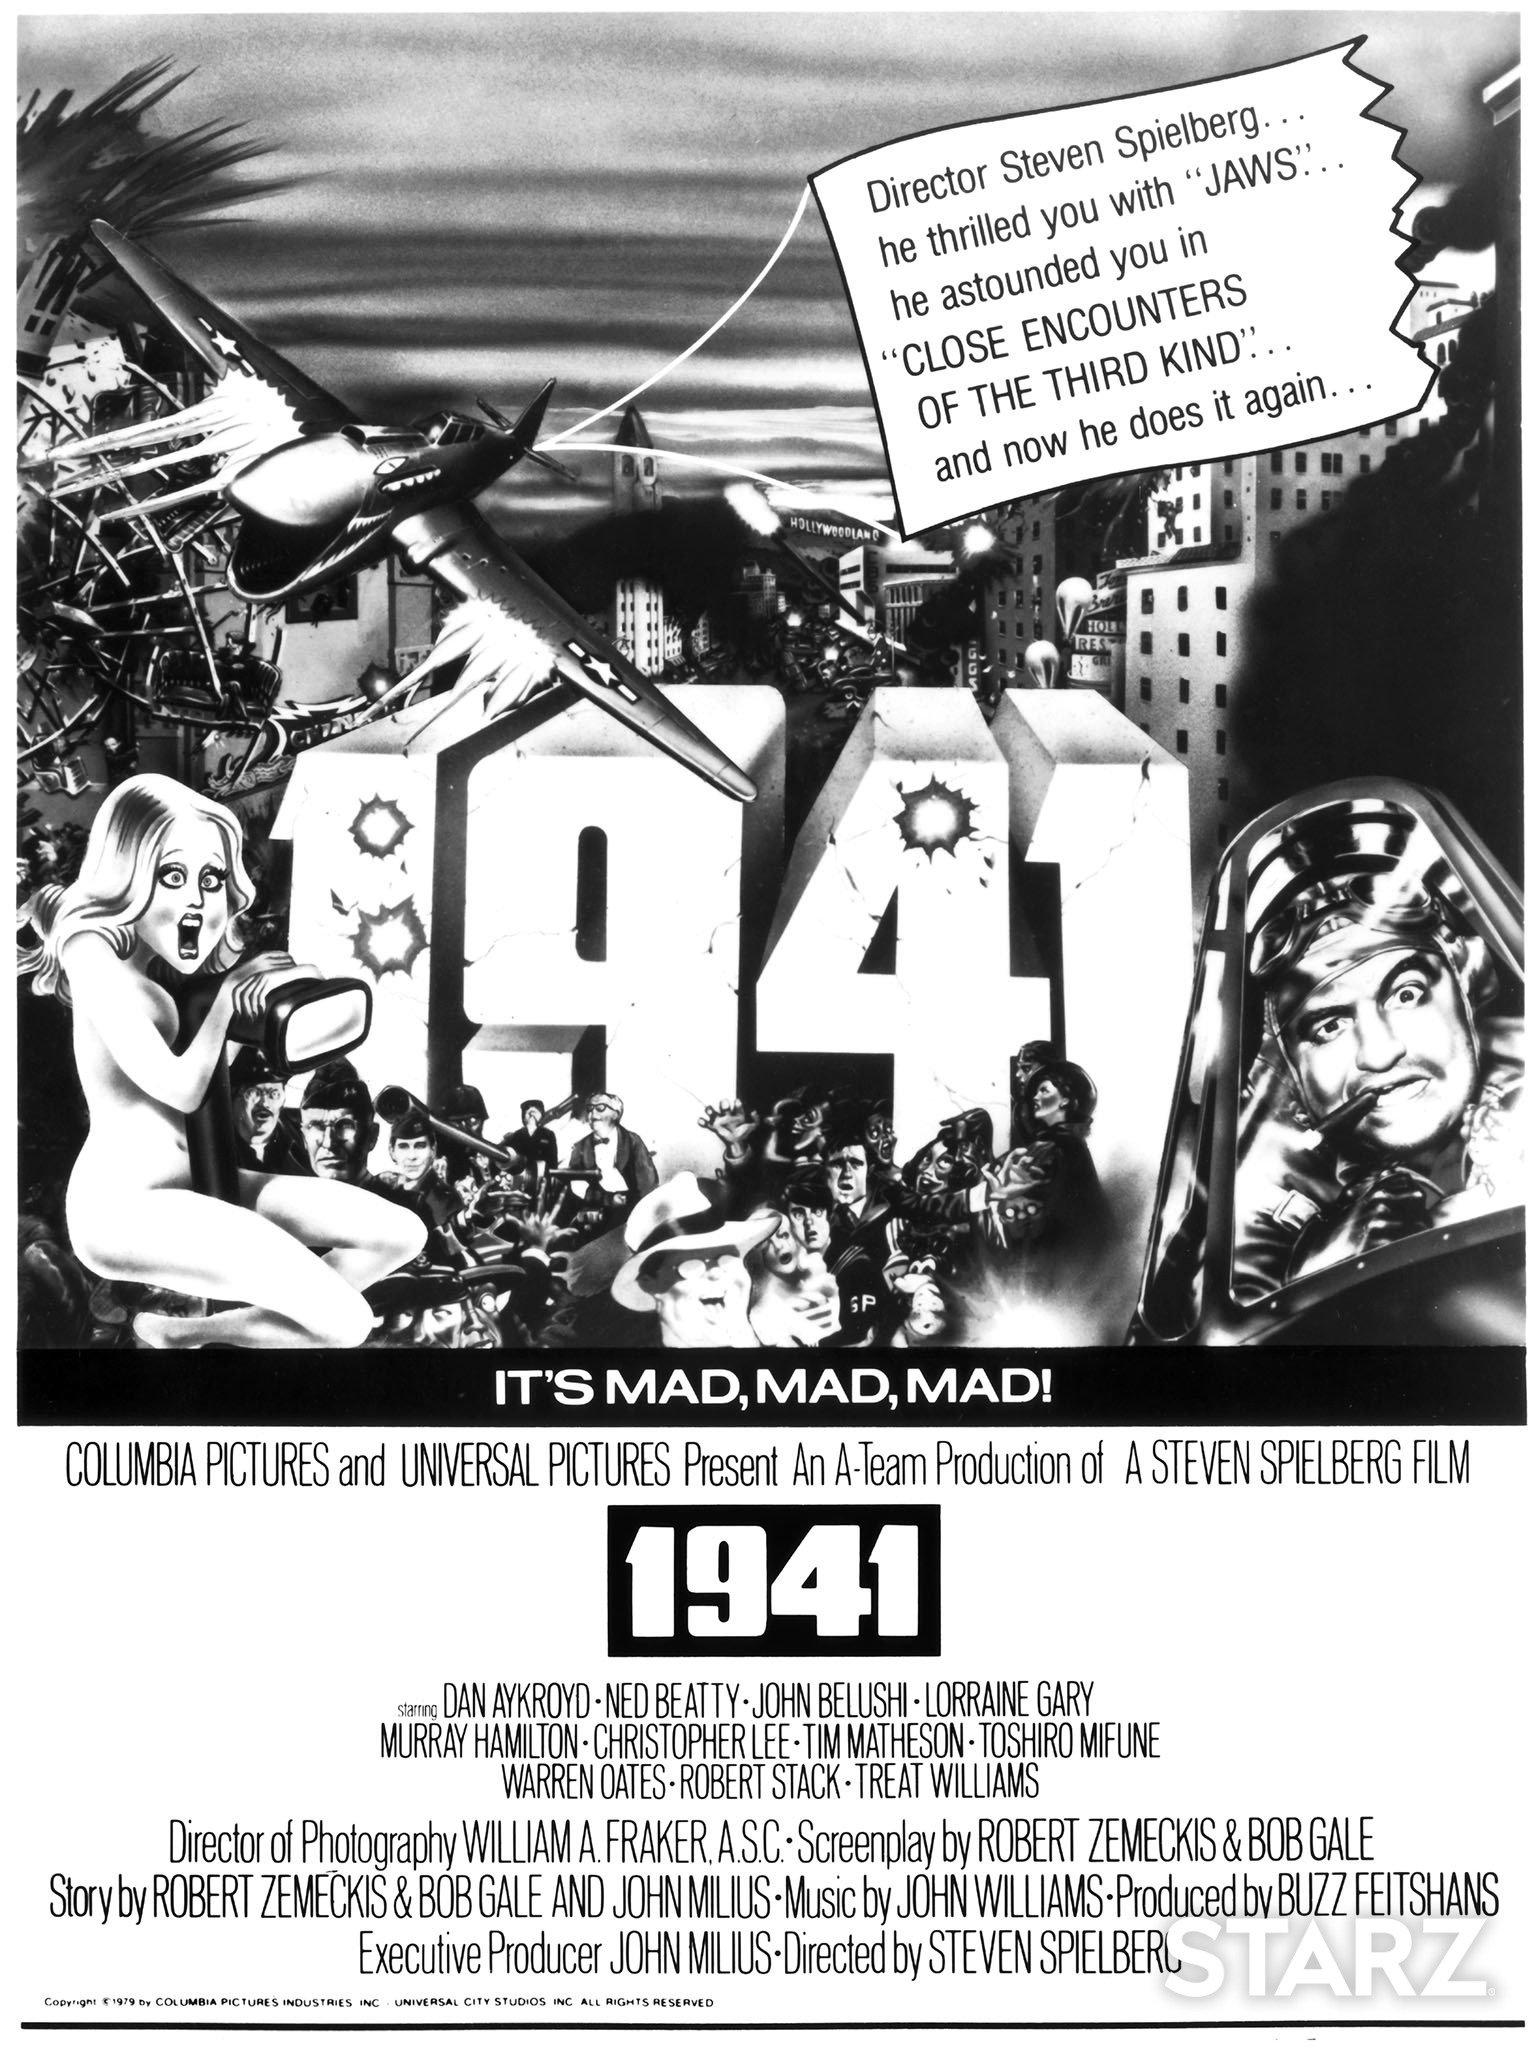 1941 by